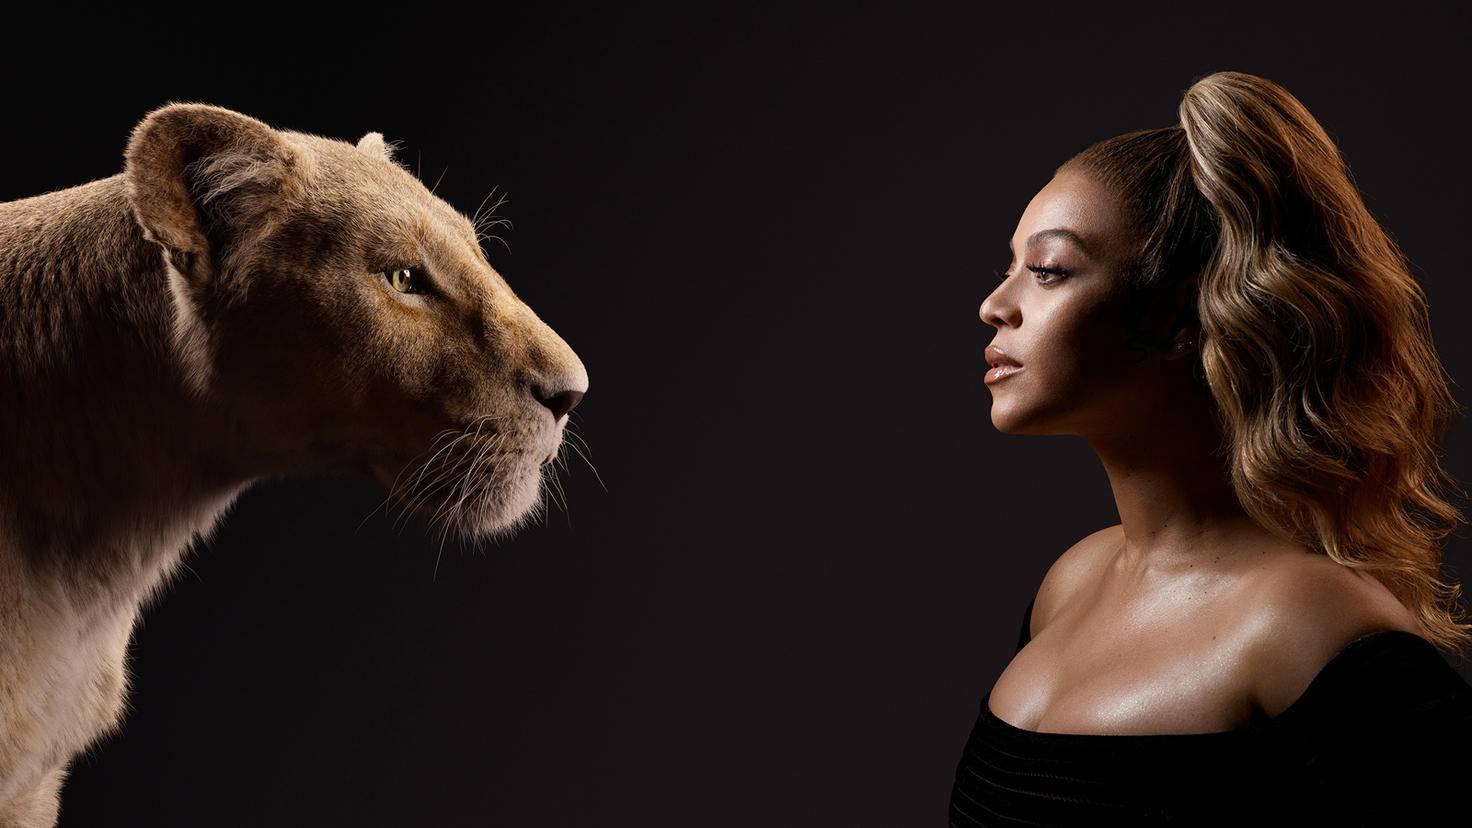 Beyonc speaks the adult lioness Nala.